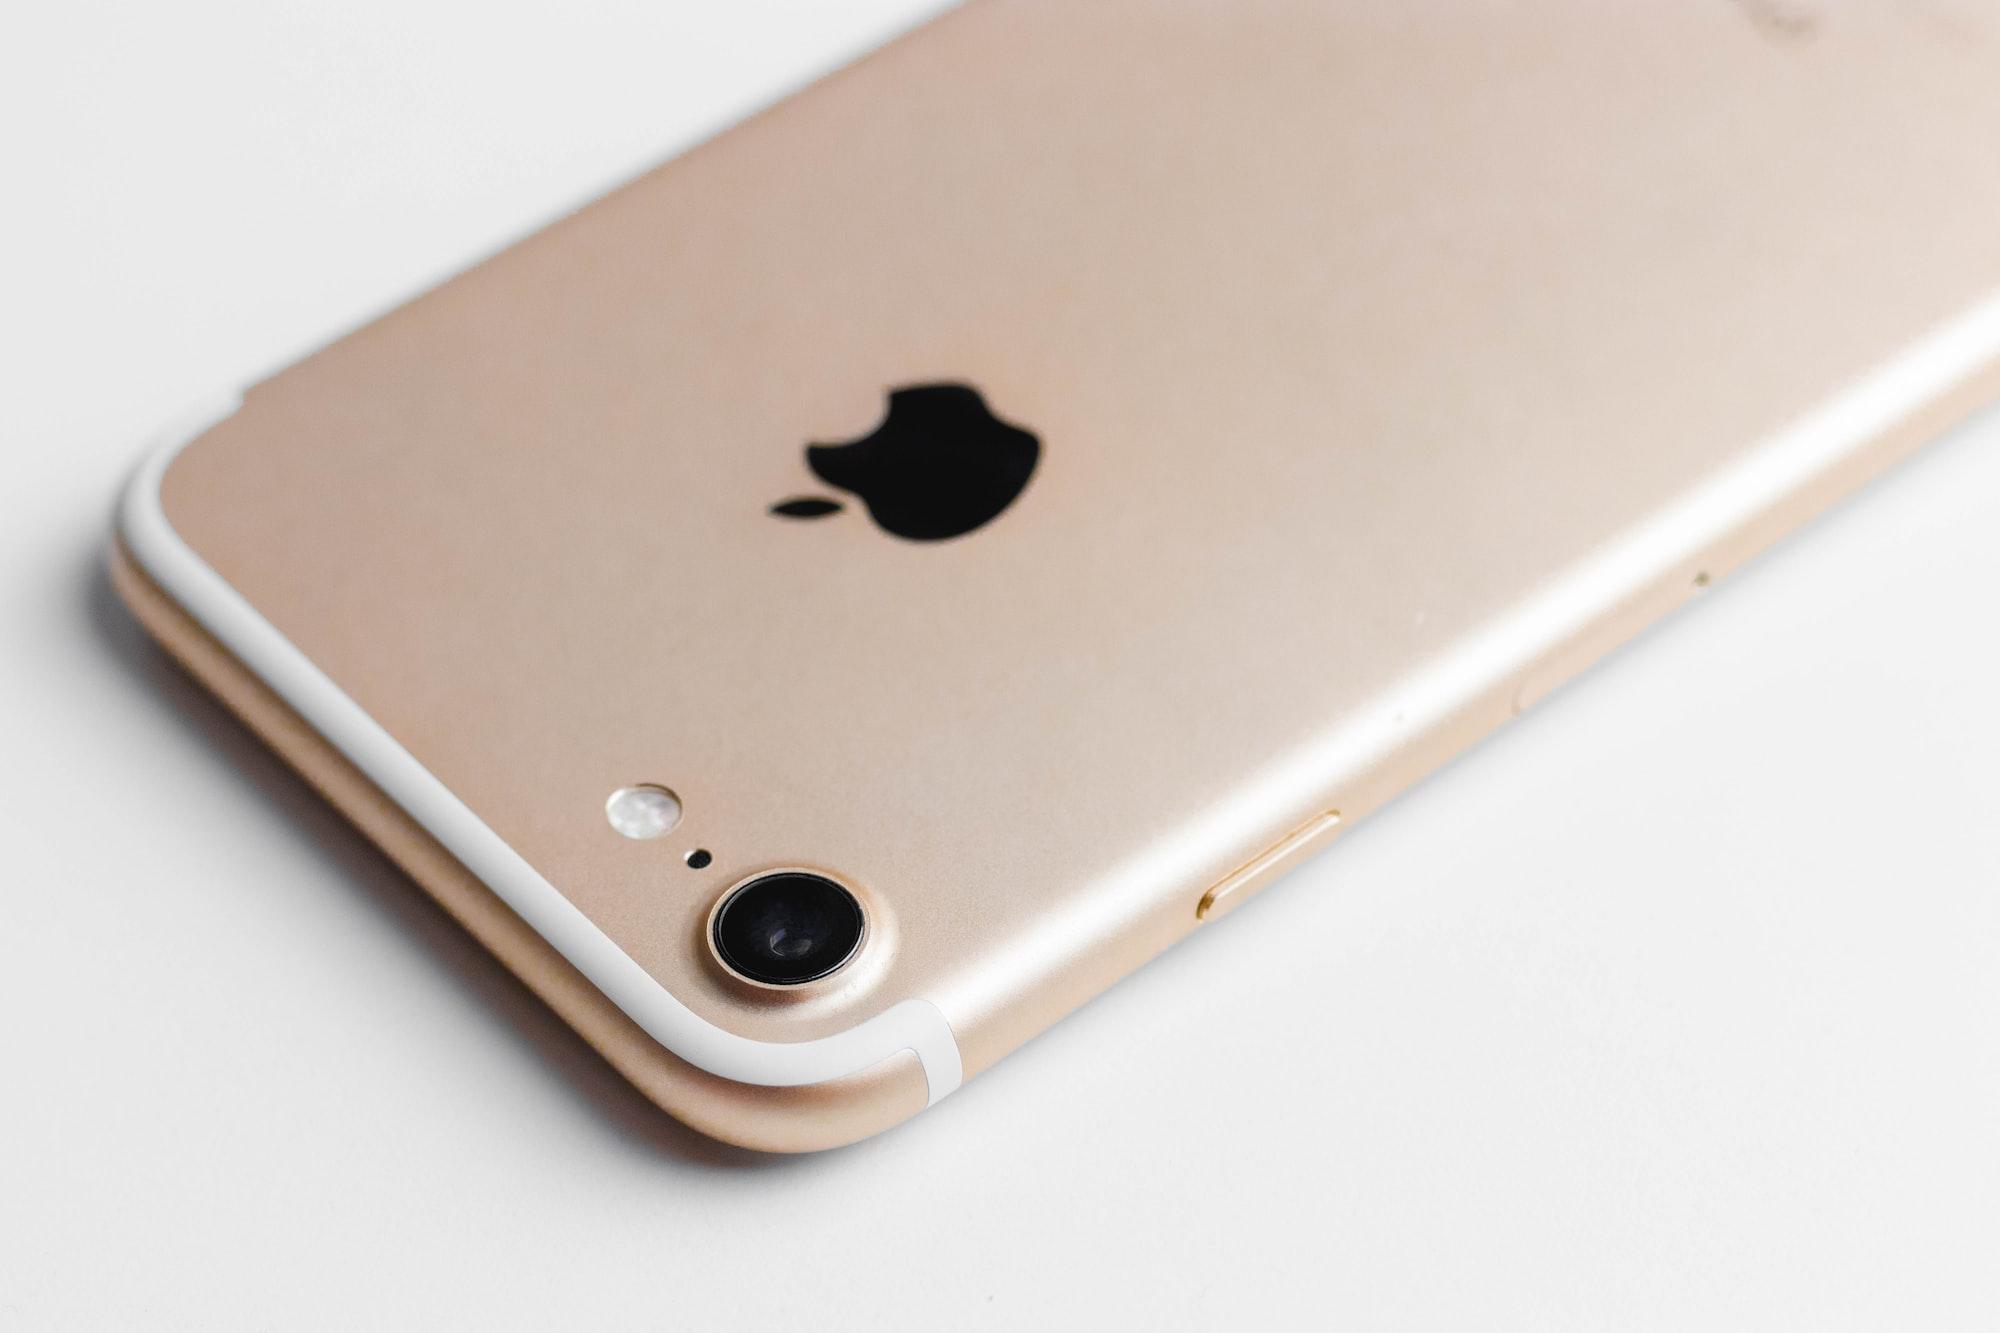 Estás a pensar trocar de iPhone? Avalia a tua retoma na iGeeks